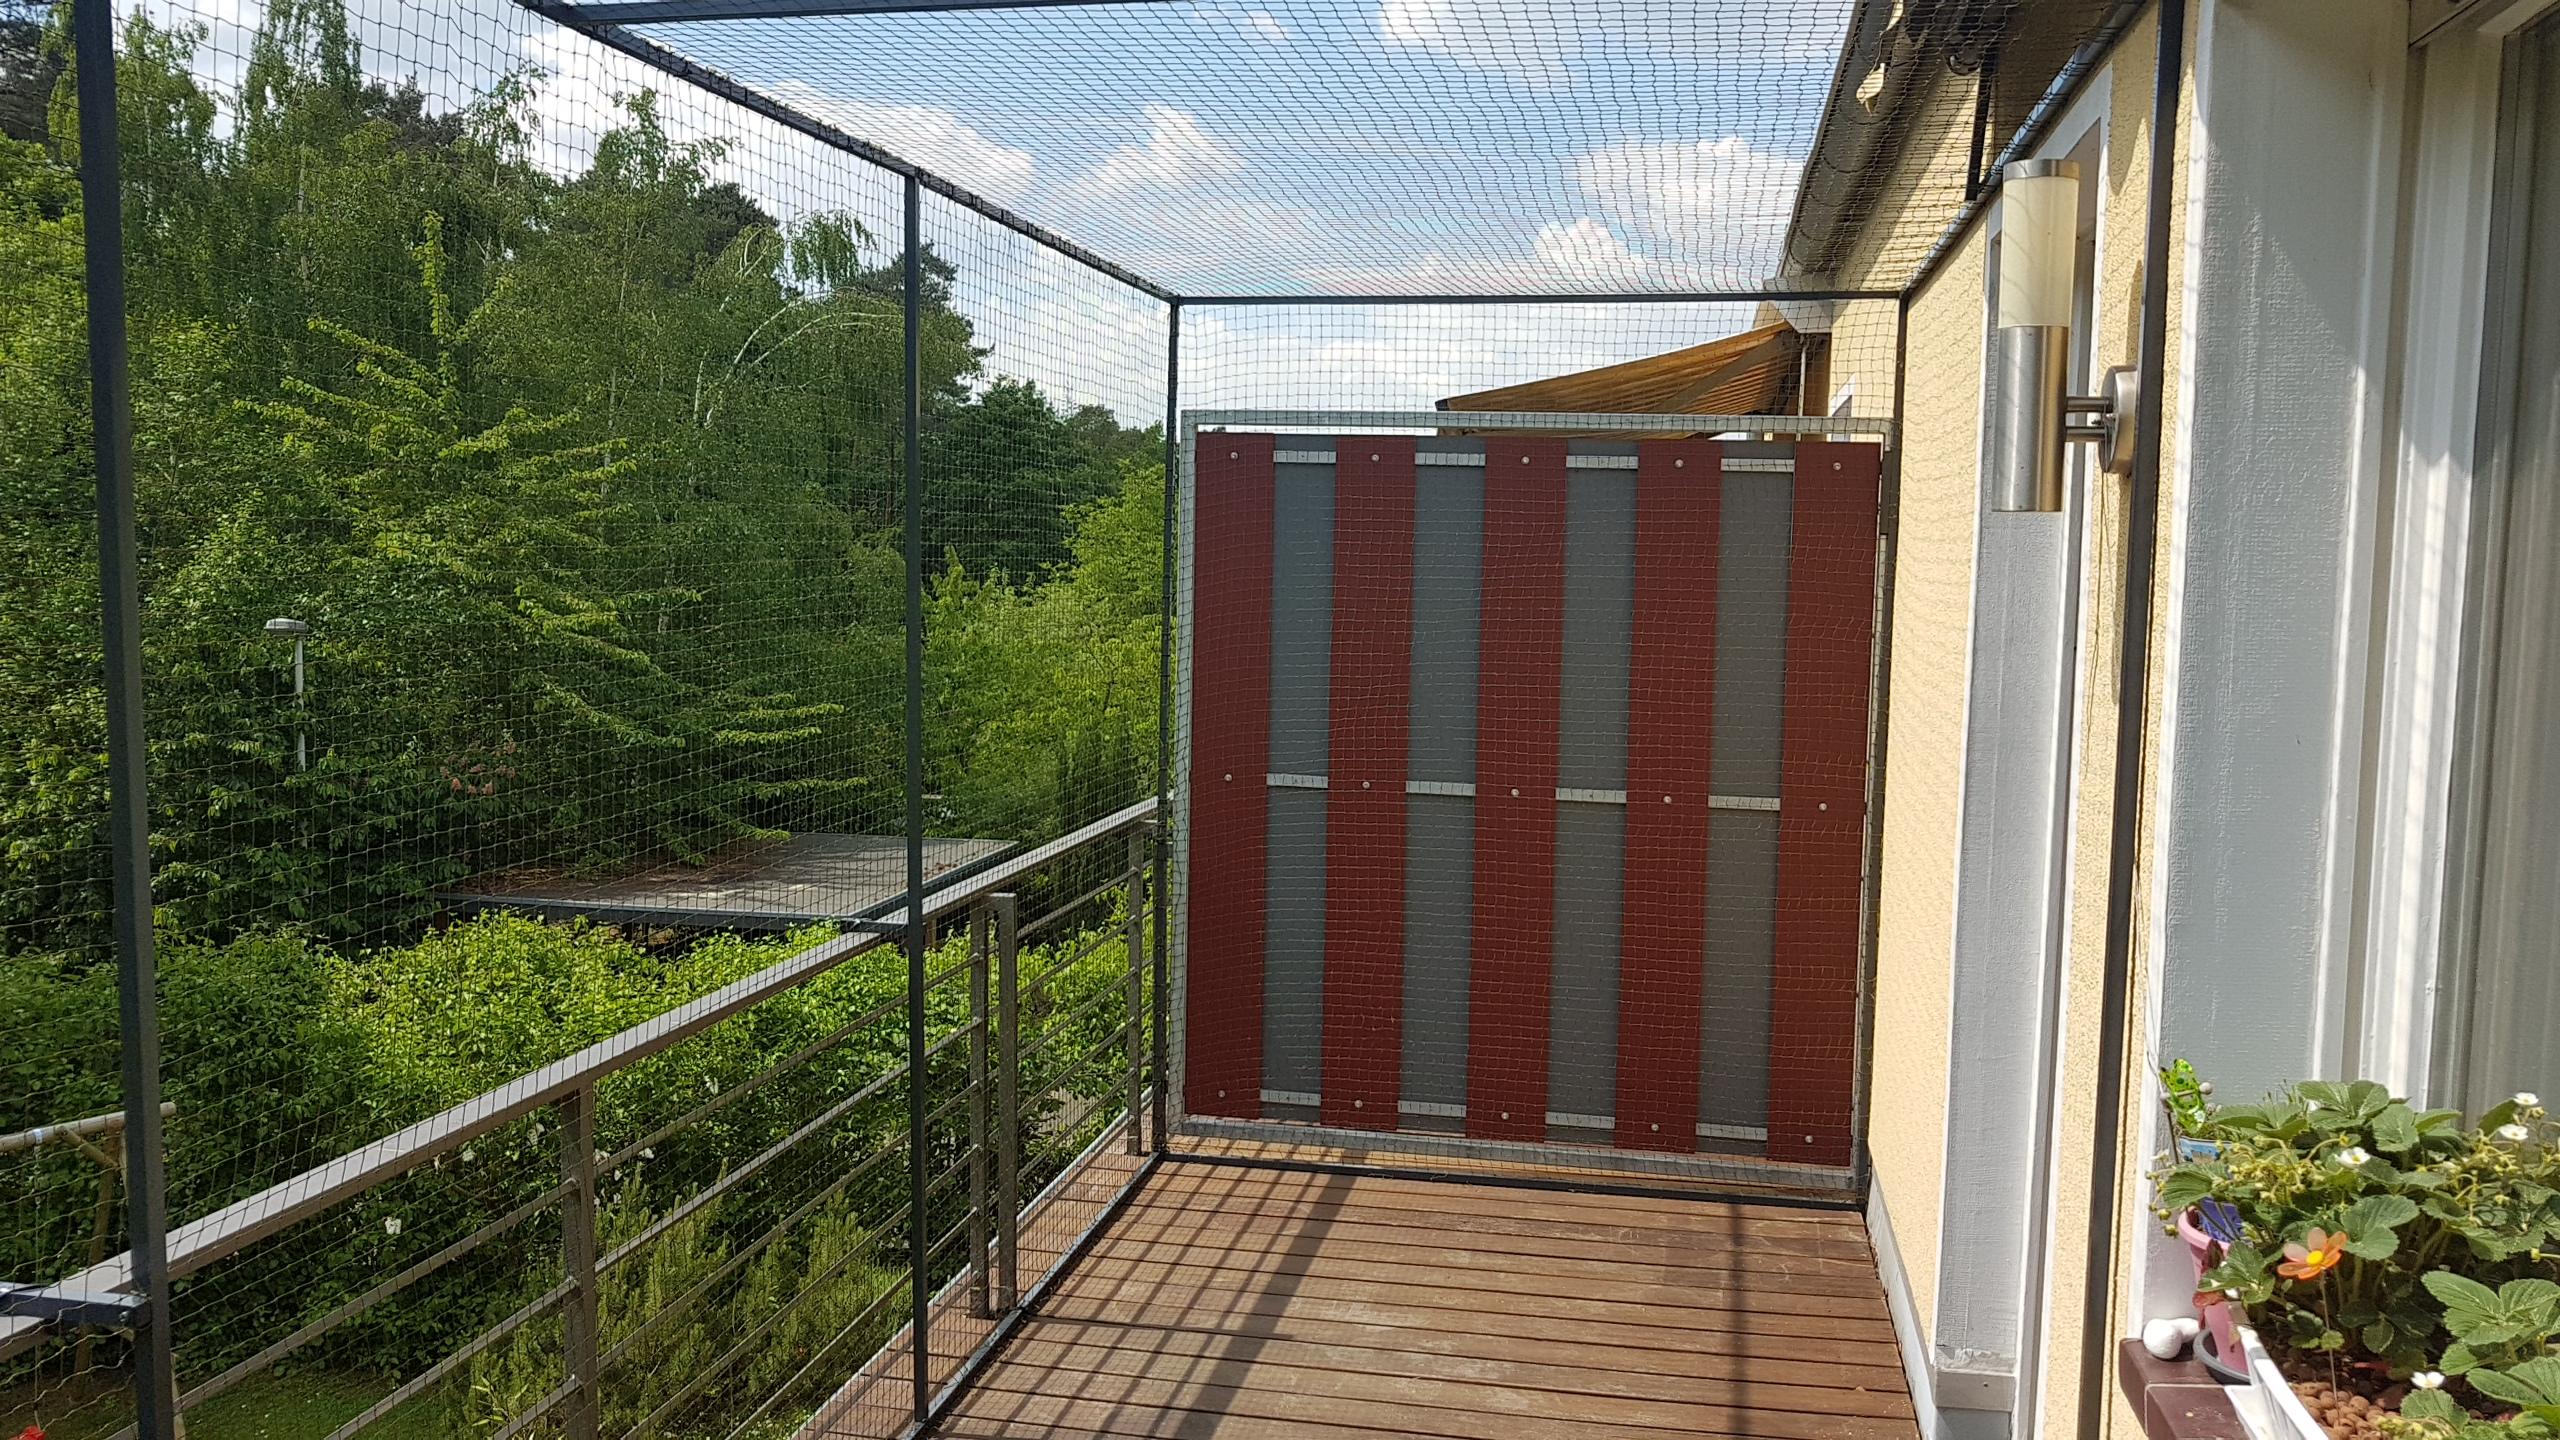 balkon ohne bohren amazing windschutz plexiglas balkon windschutz plexiglas fur aus ohne bohren. Black Bedroom Furniture Sets. Home Design Ideas